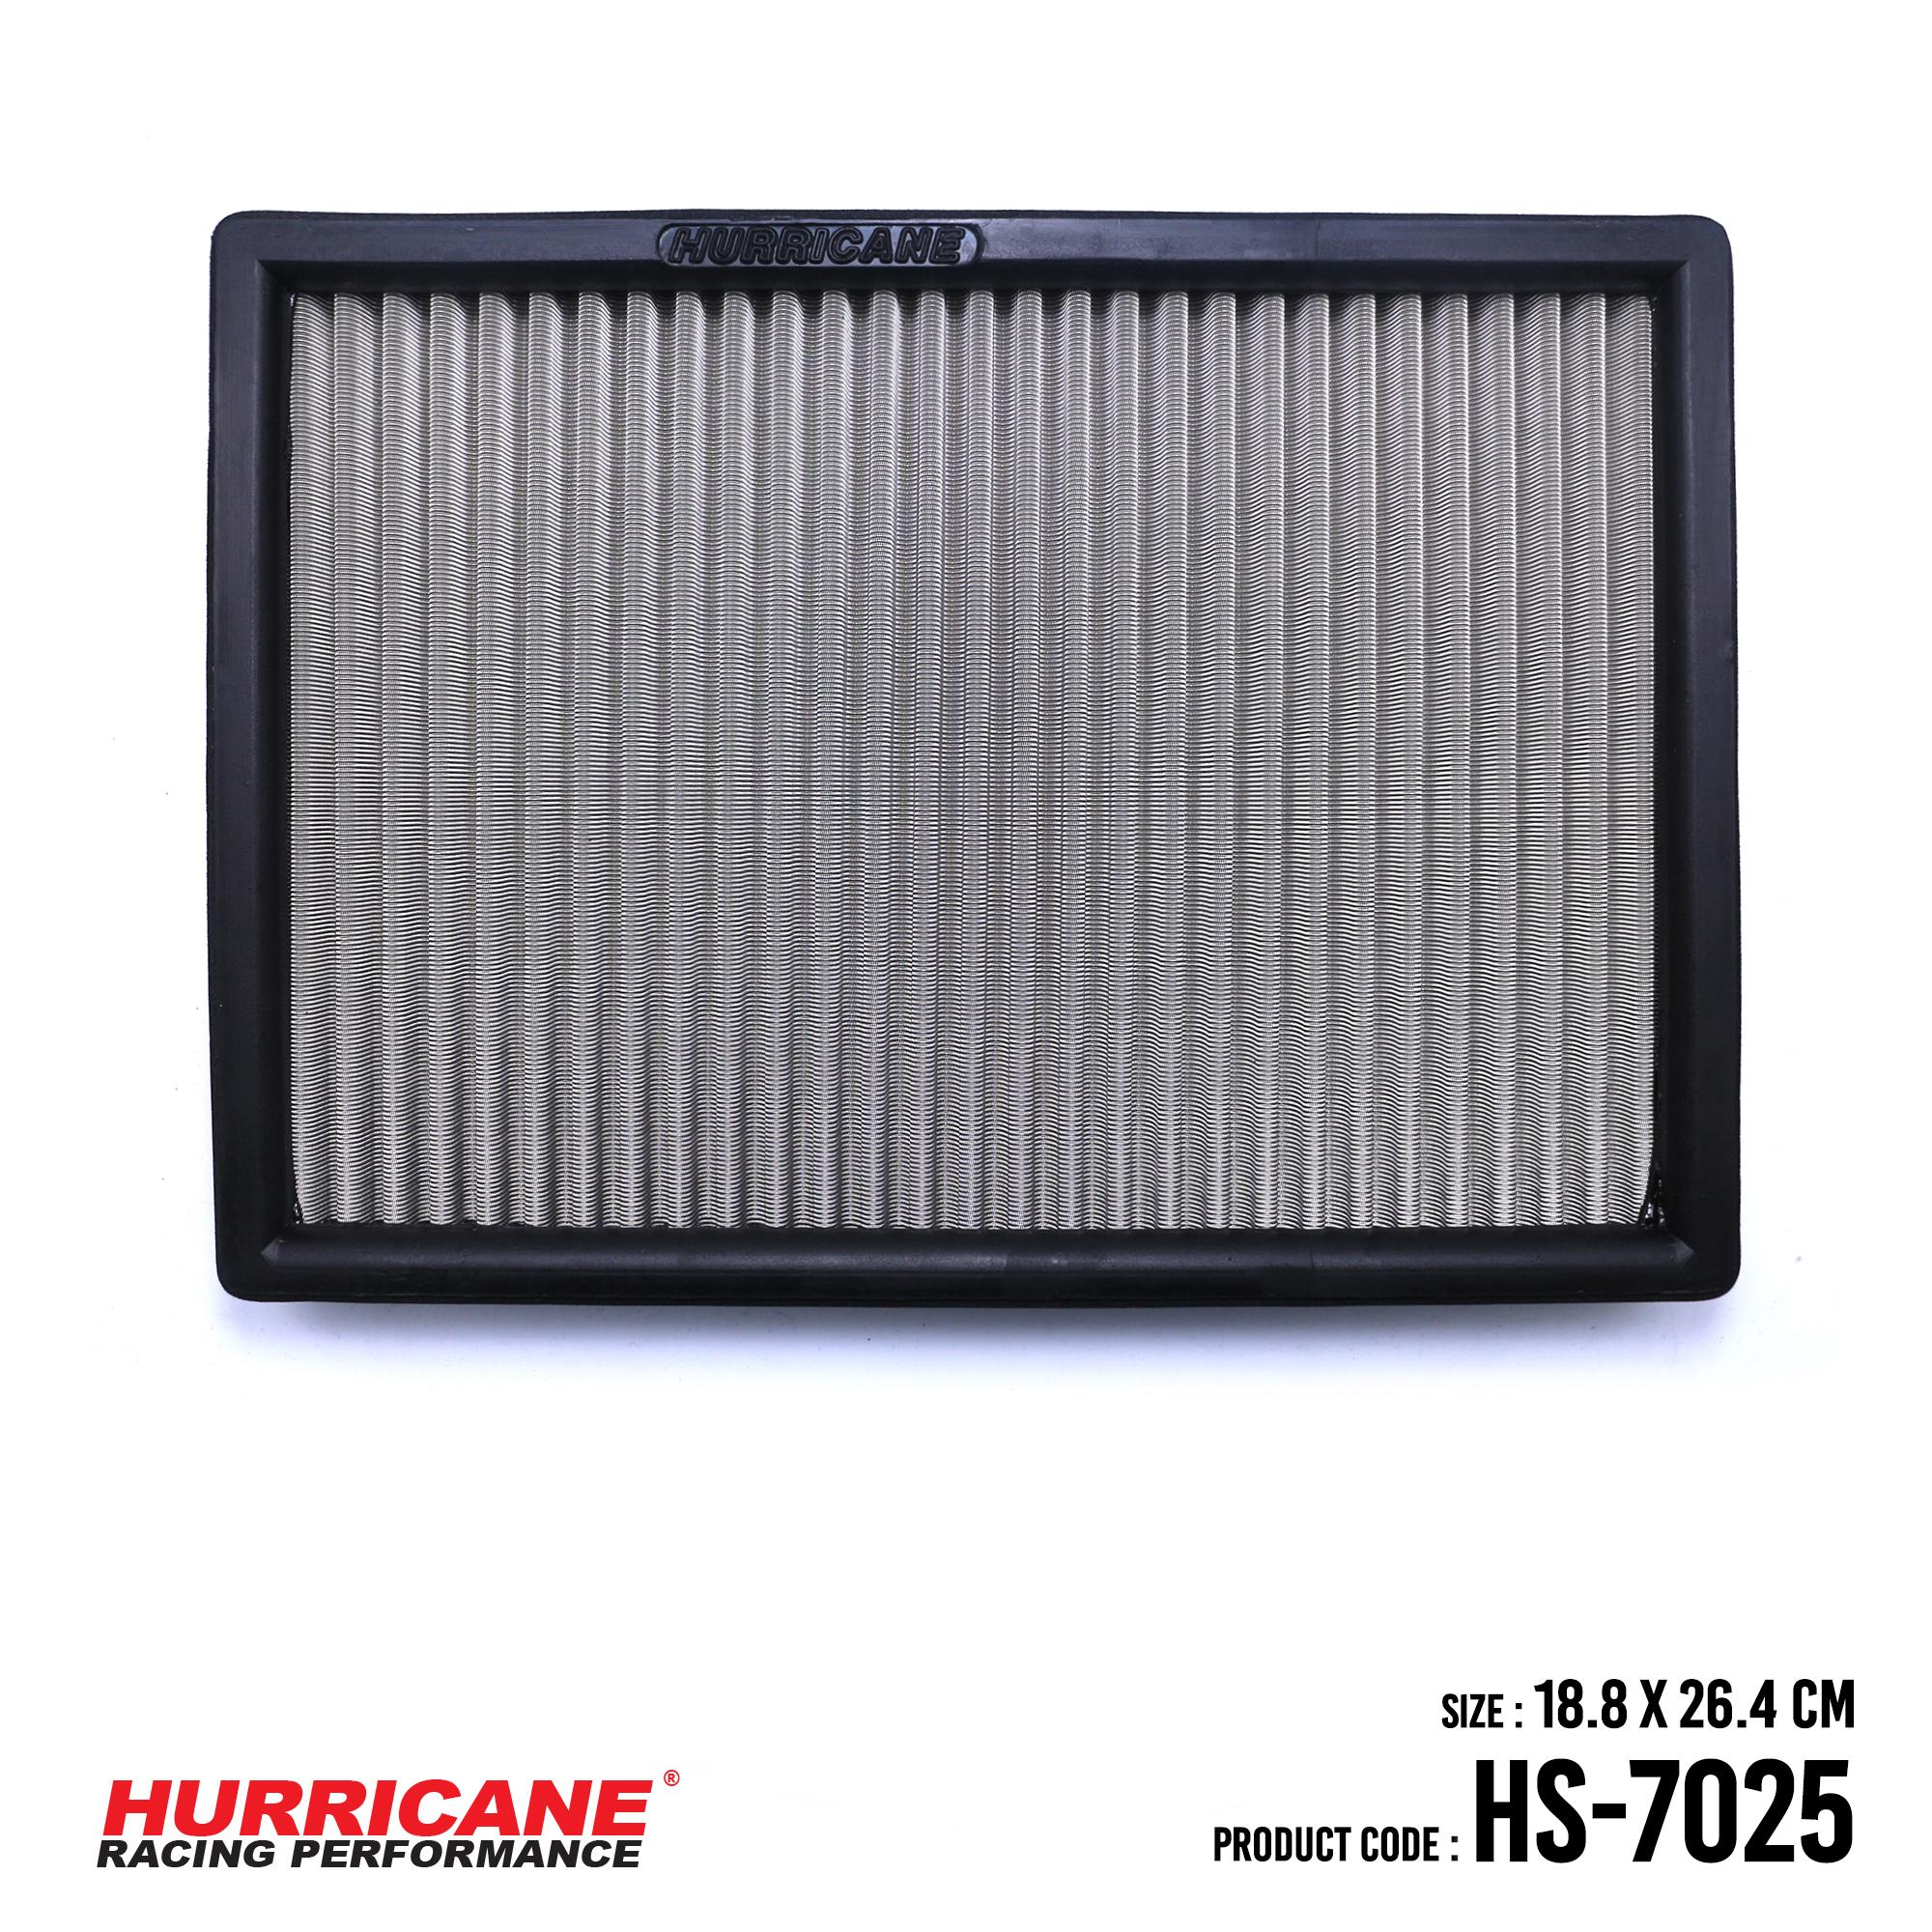 HURRICANE STAINLESS STEEL CABIN AIR FILTER FOR HS-7025 Chevrolet